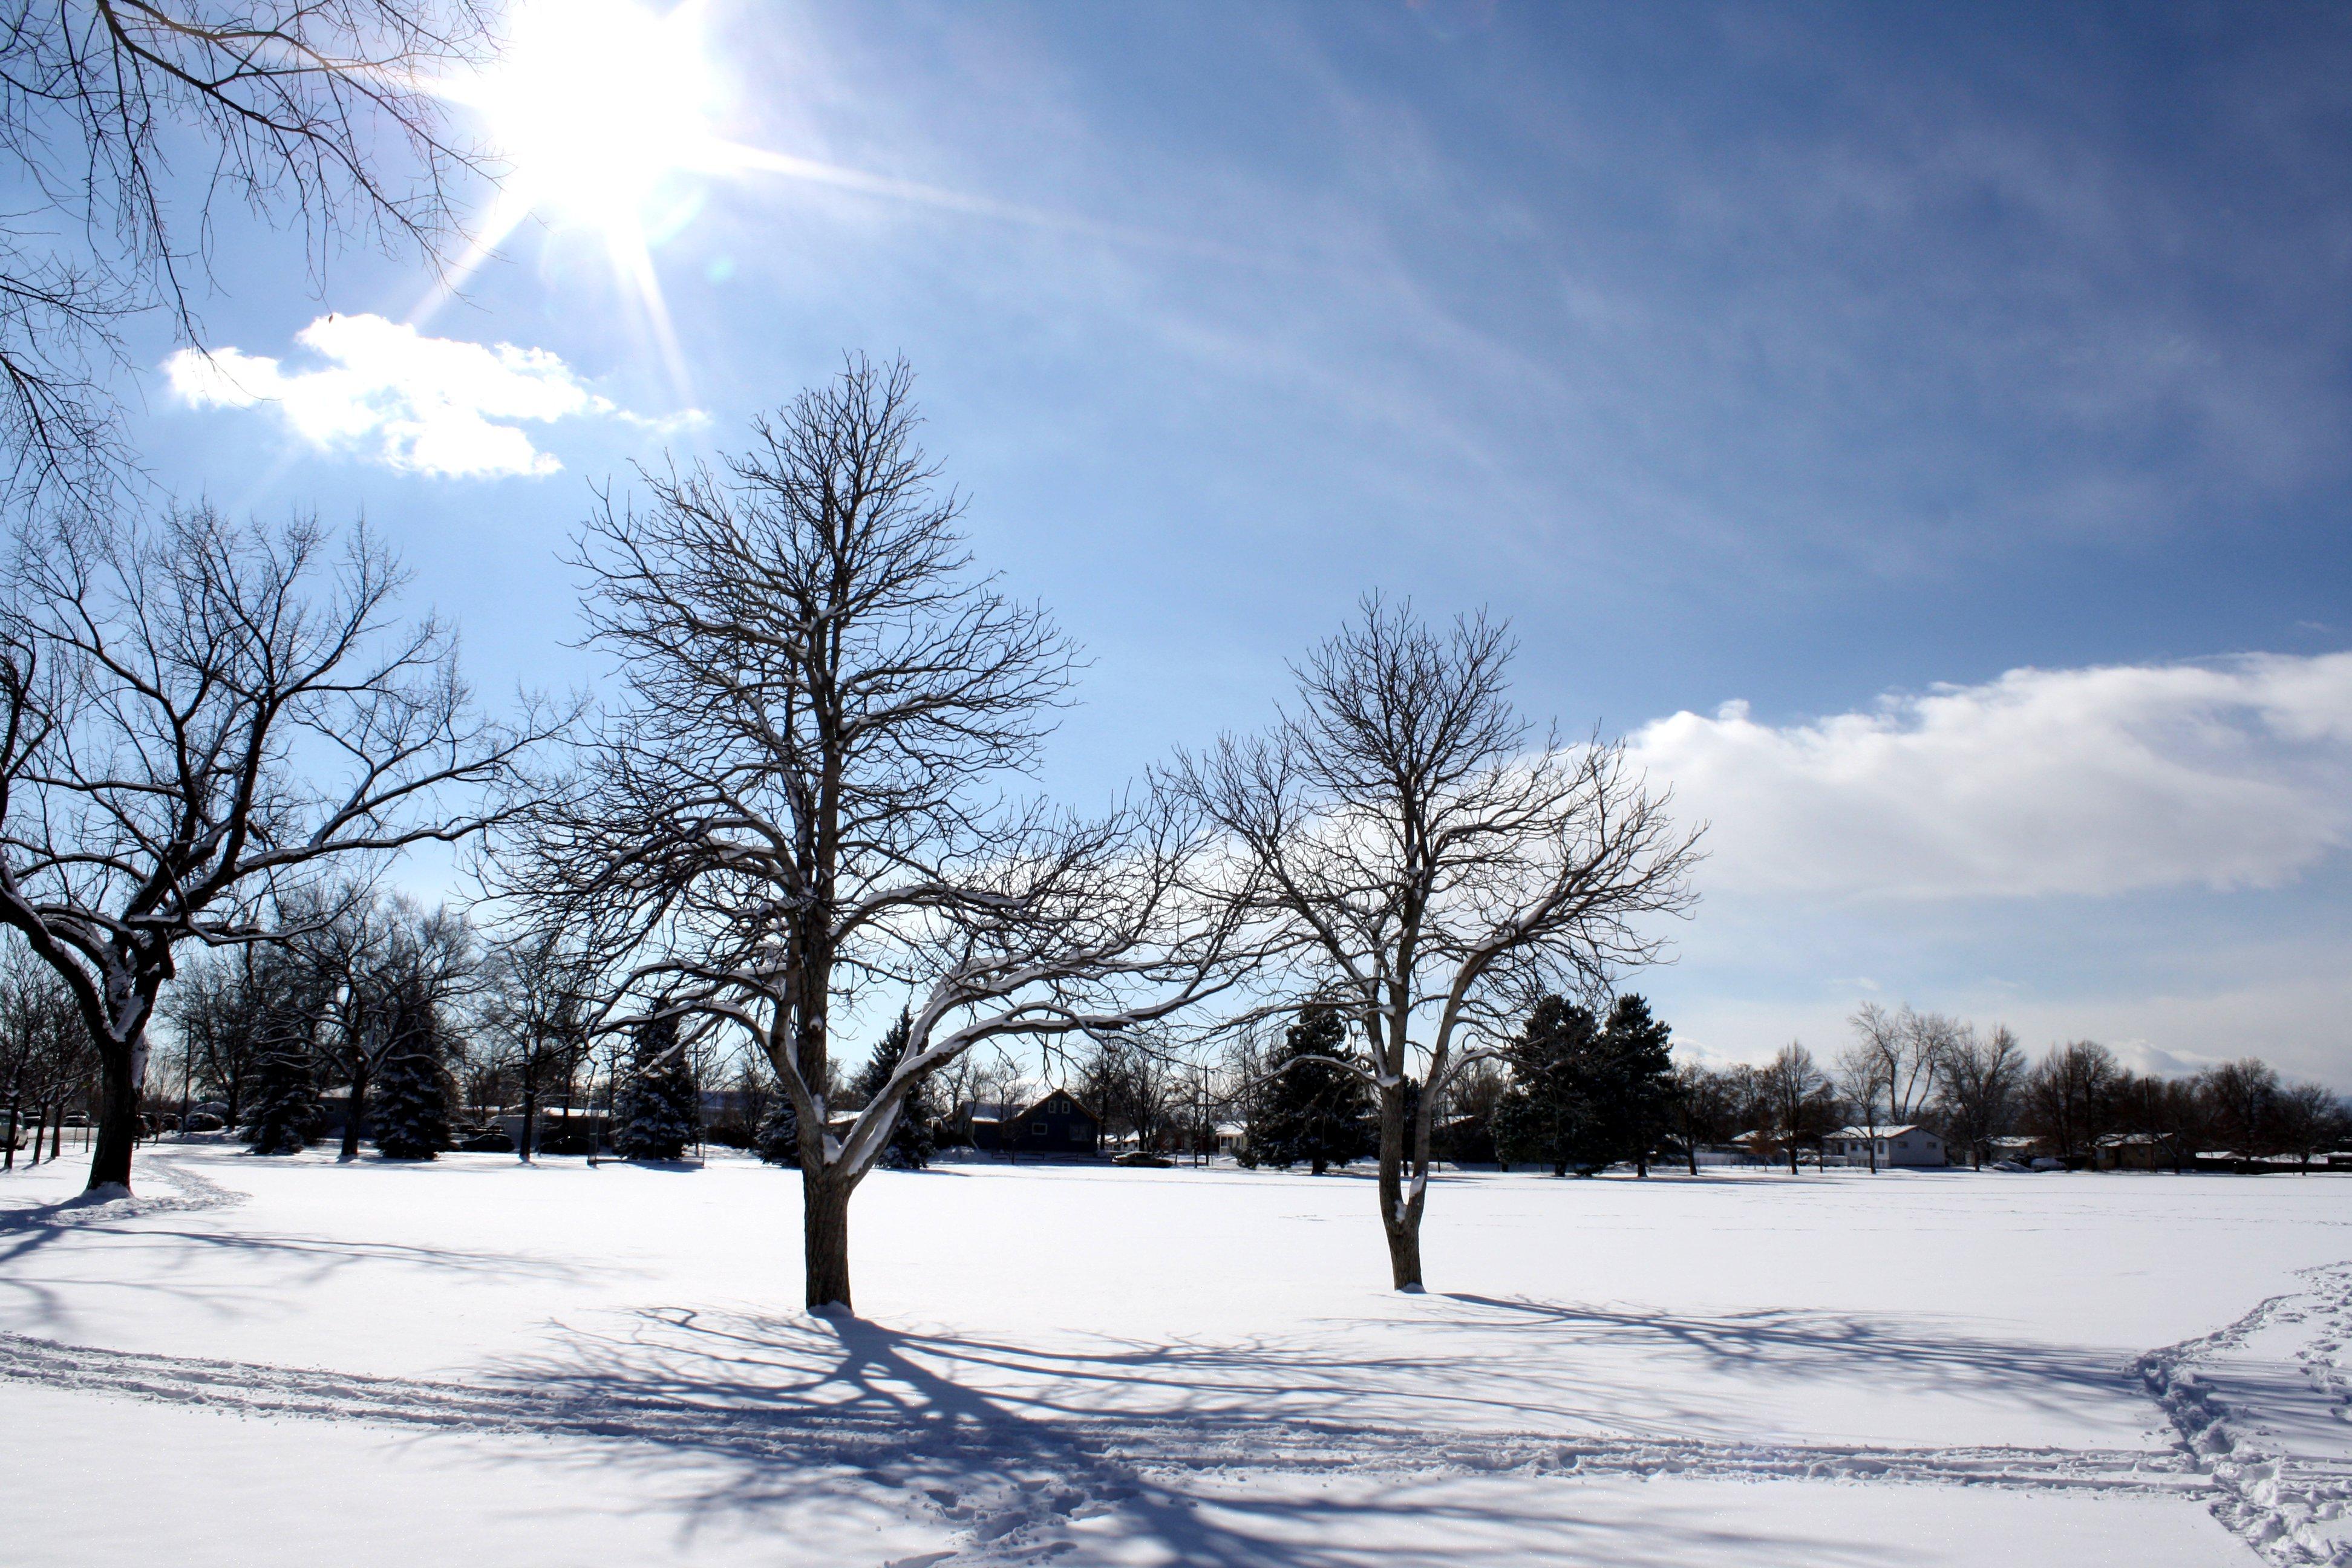 Sunny Winter Day Picture Free Graph Public